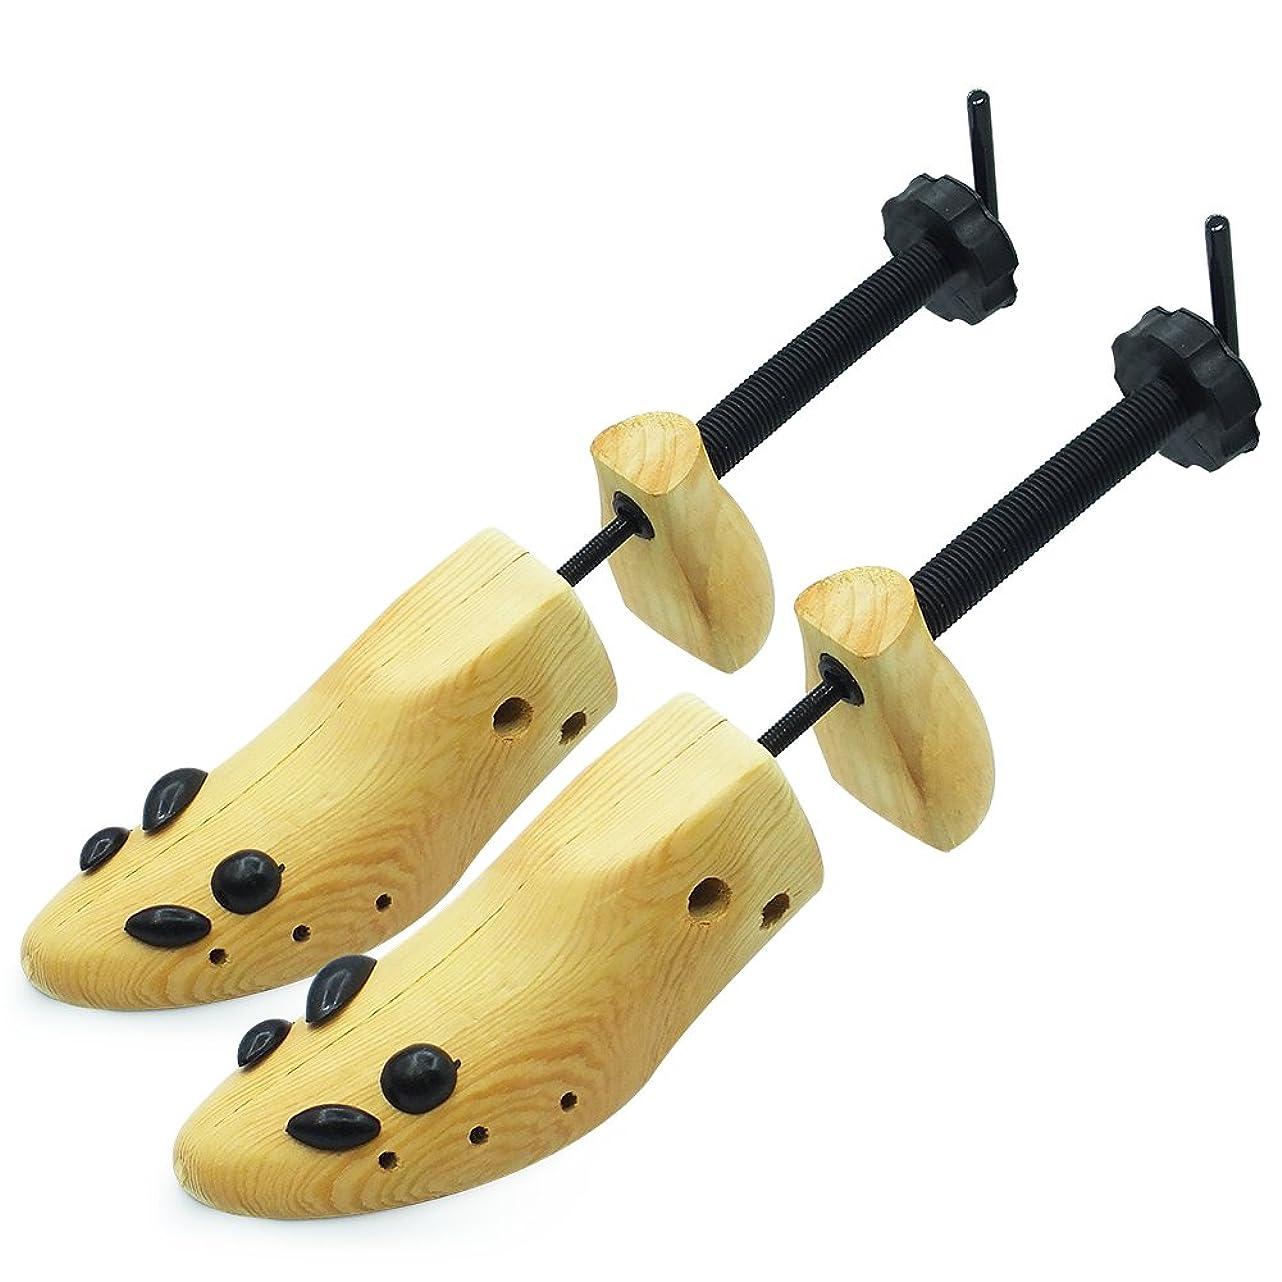 Wooden Shoe Stretcher Adjustable 2-Way Shoe Trees For Men & Women,Set of 2 zcq031669119171